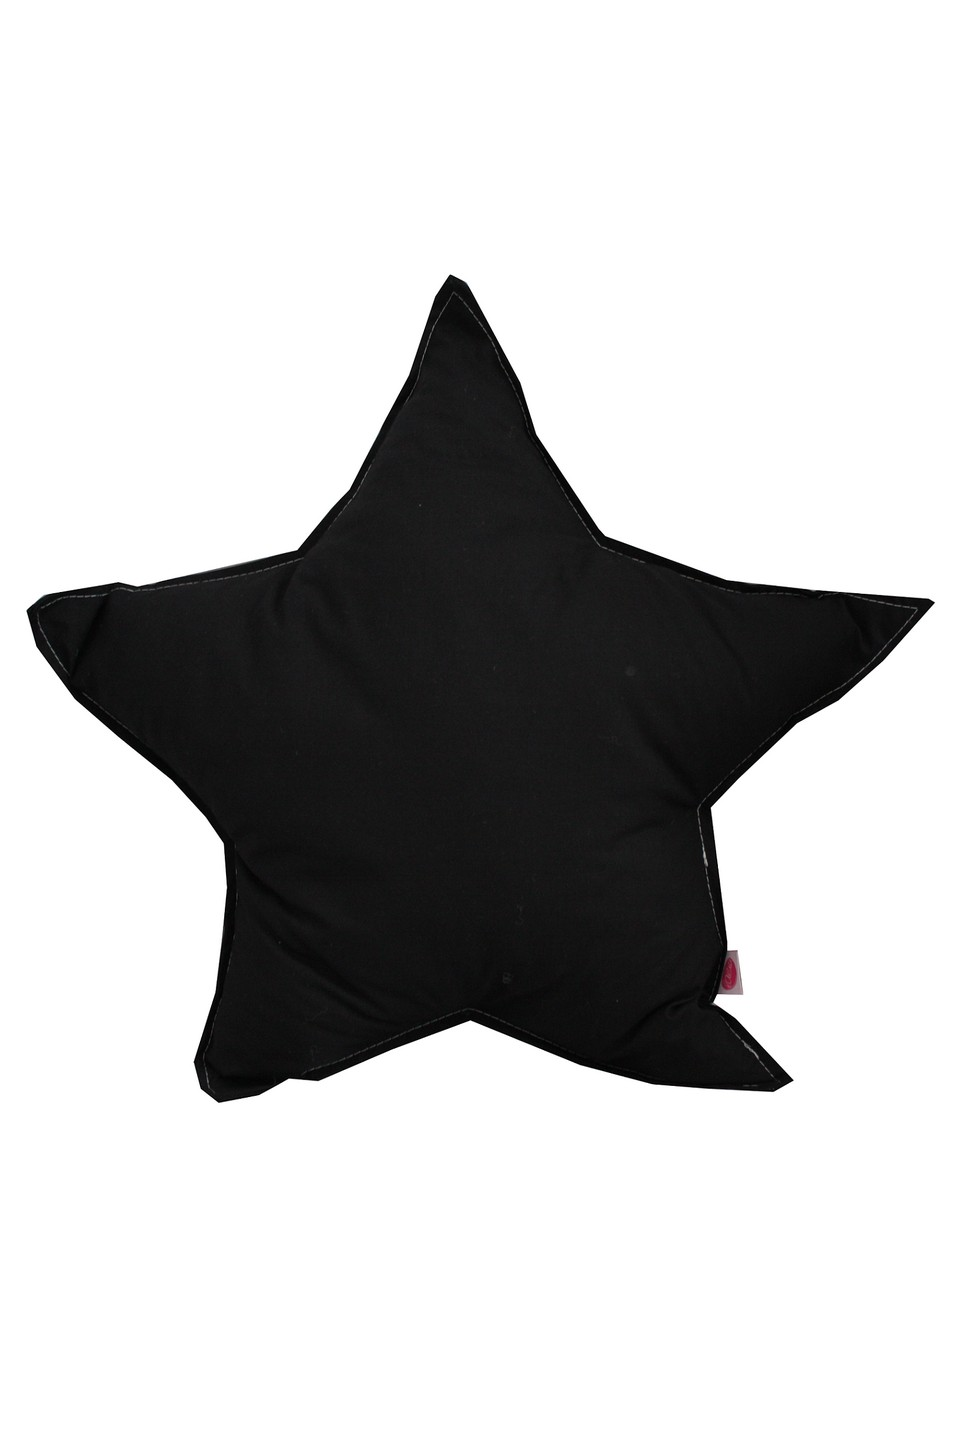 Black Star Children's Cushion